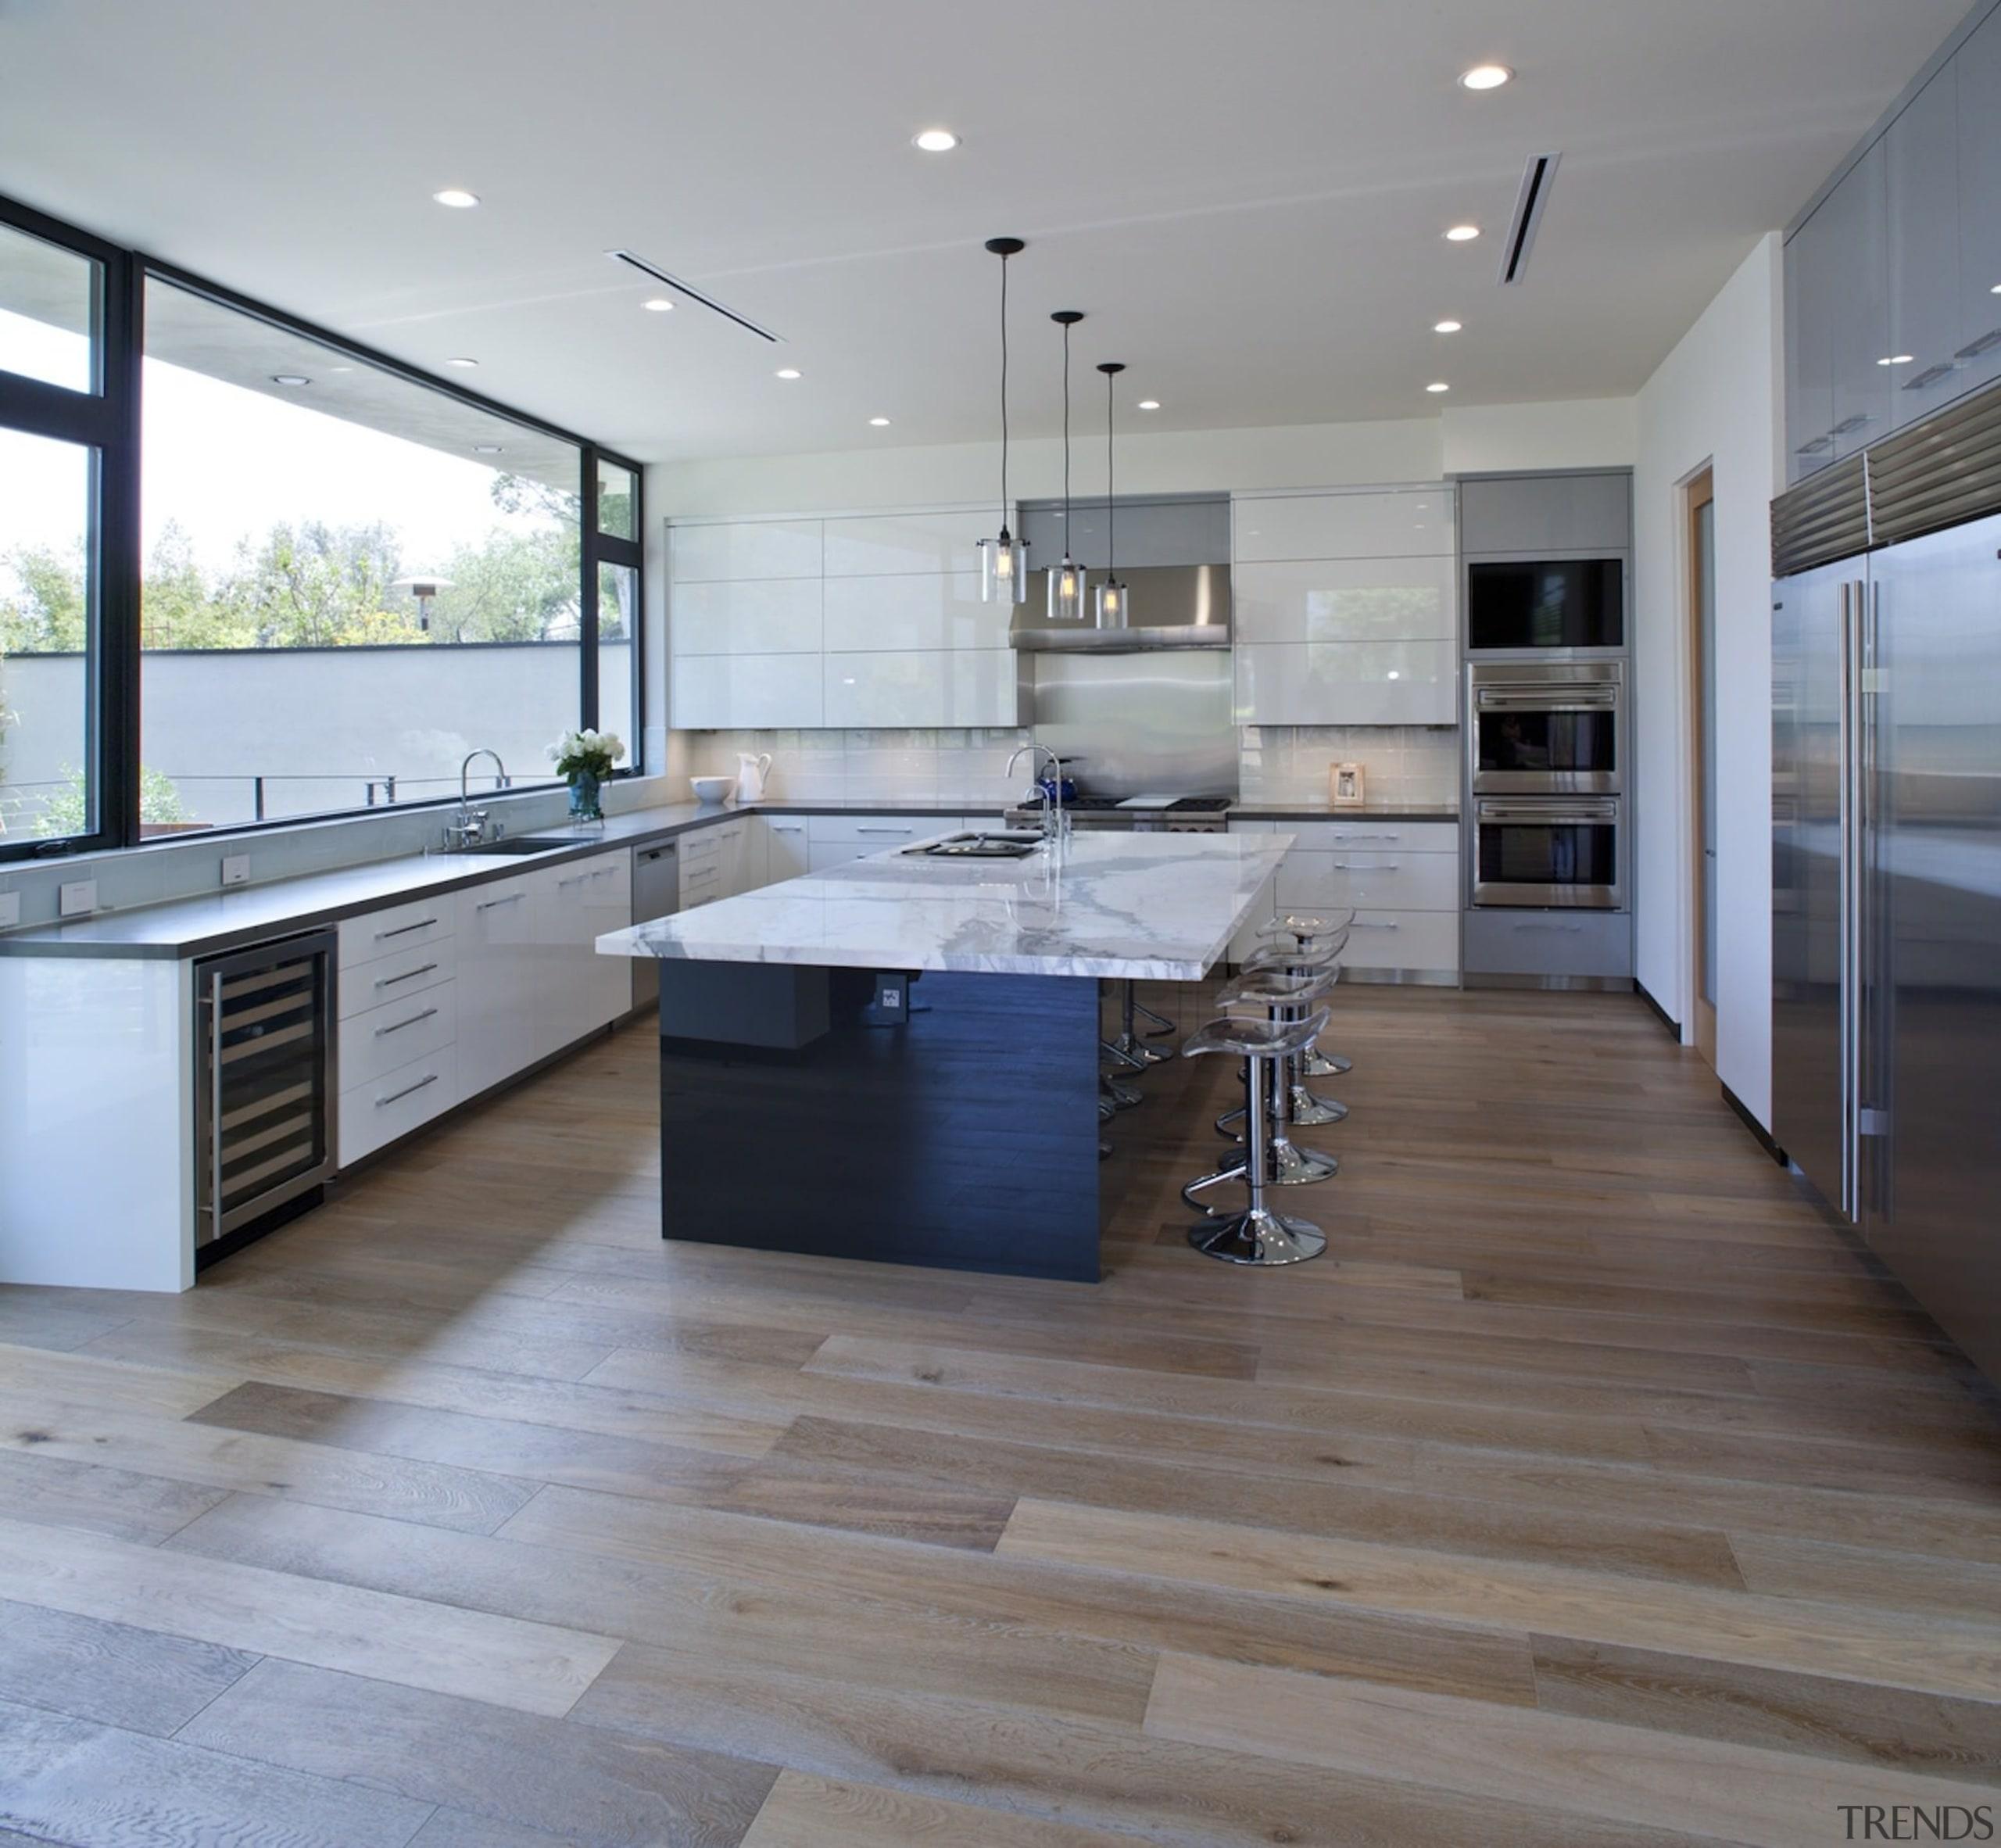 The spacious kitchen keeps the island close - countertop, floor, flooring, hardwood, interior design, kitchen, laminate flooring, real estate, tile, wood, wood flooring, gray